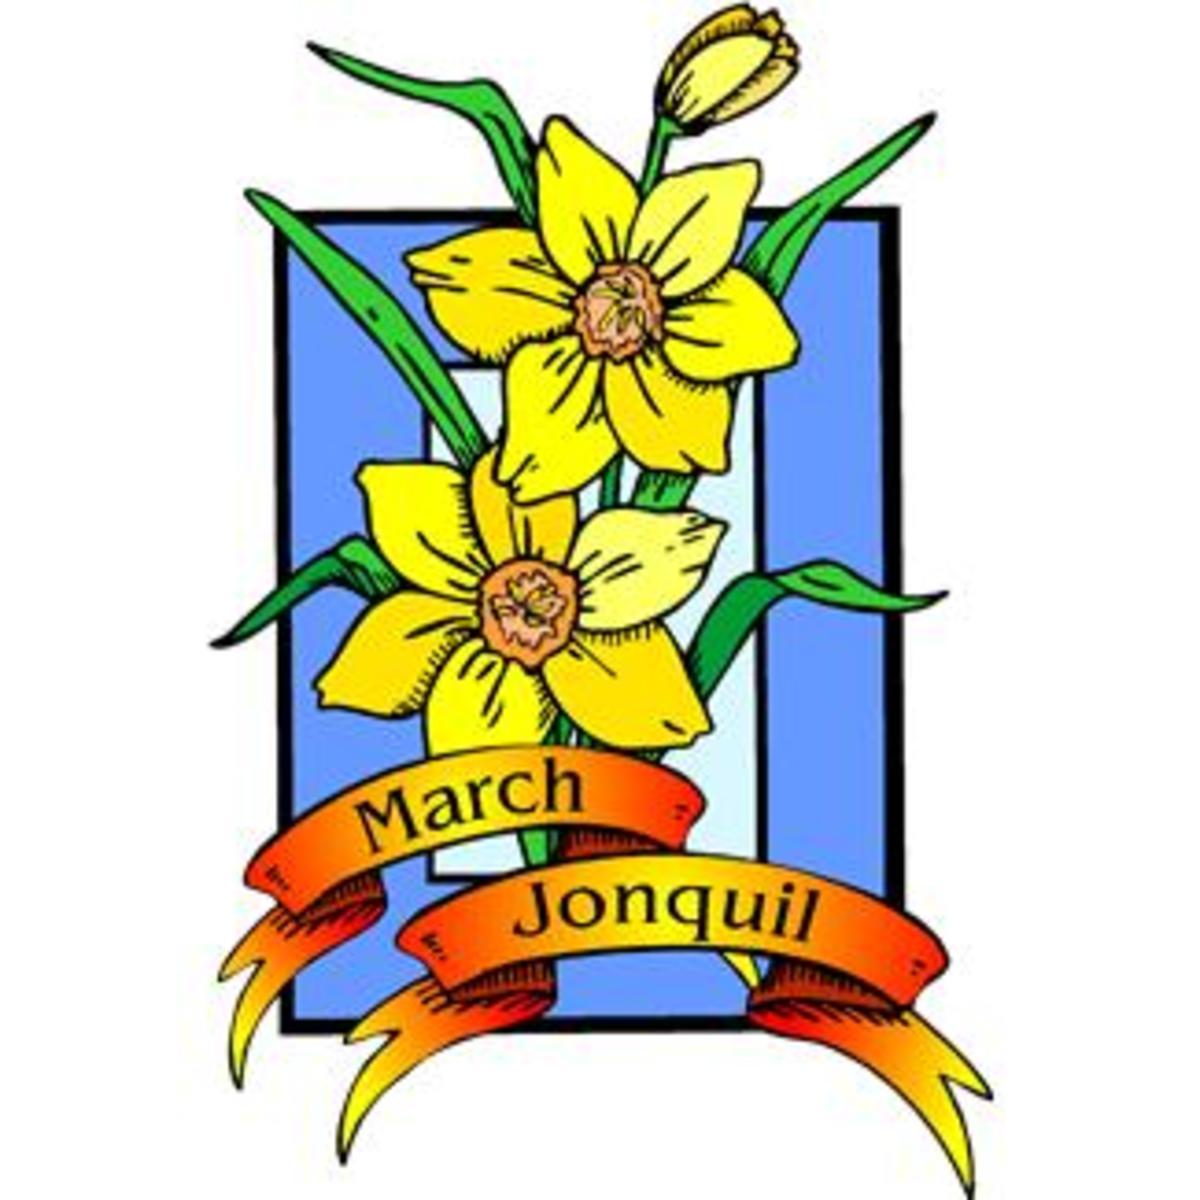 March Jonquils